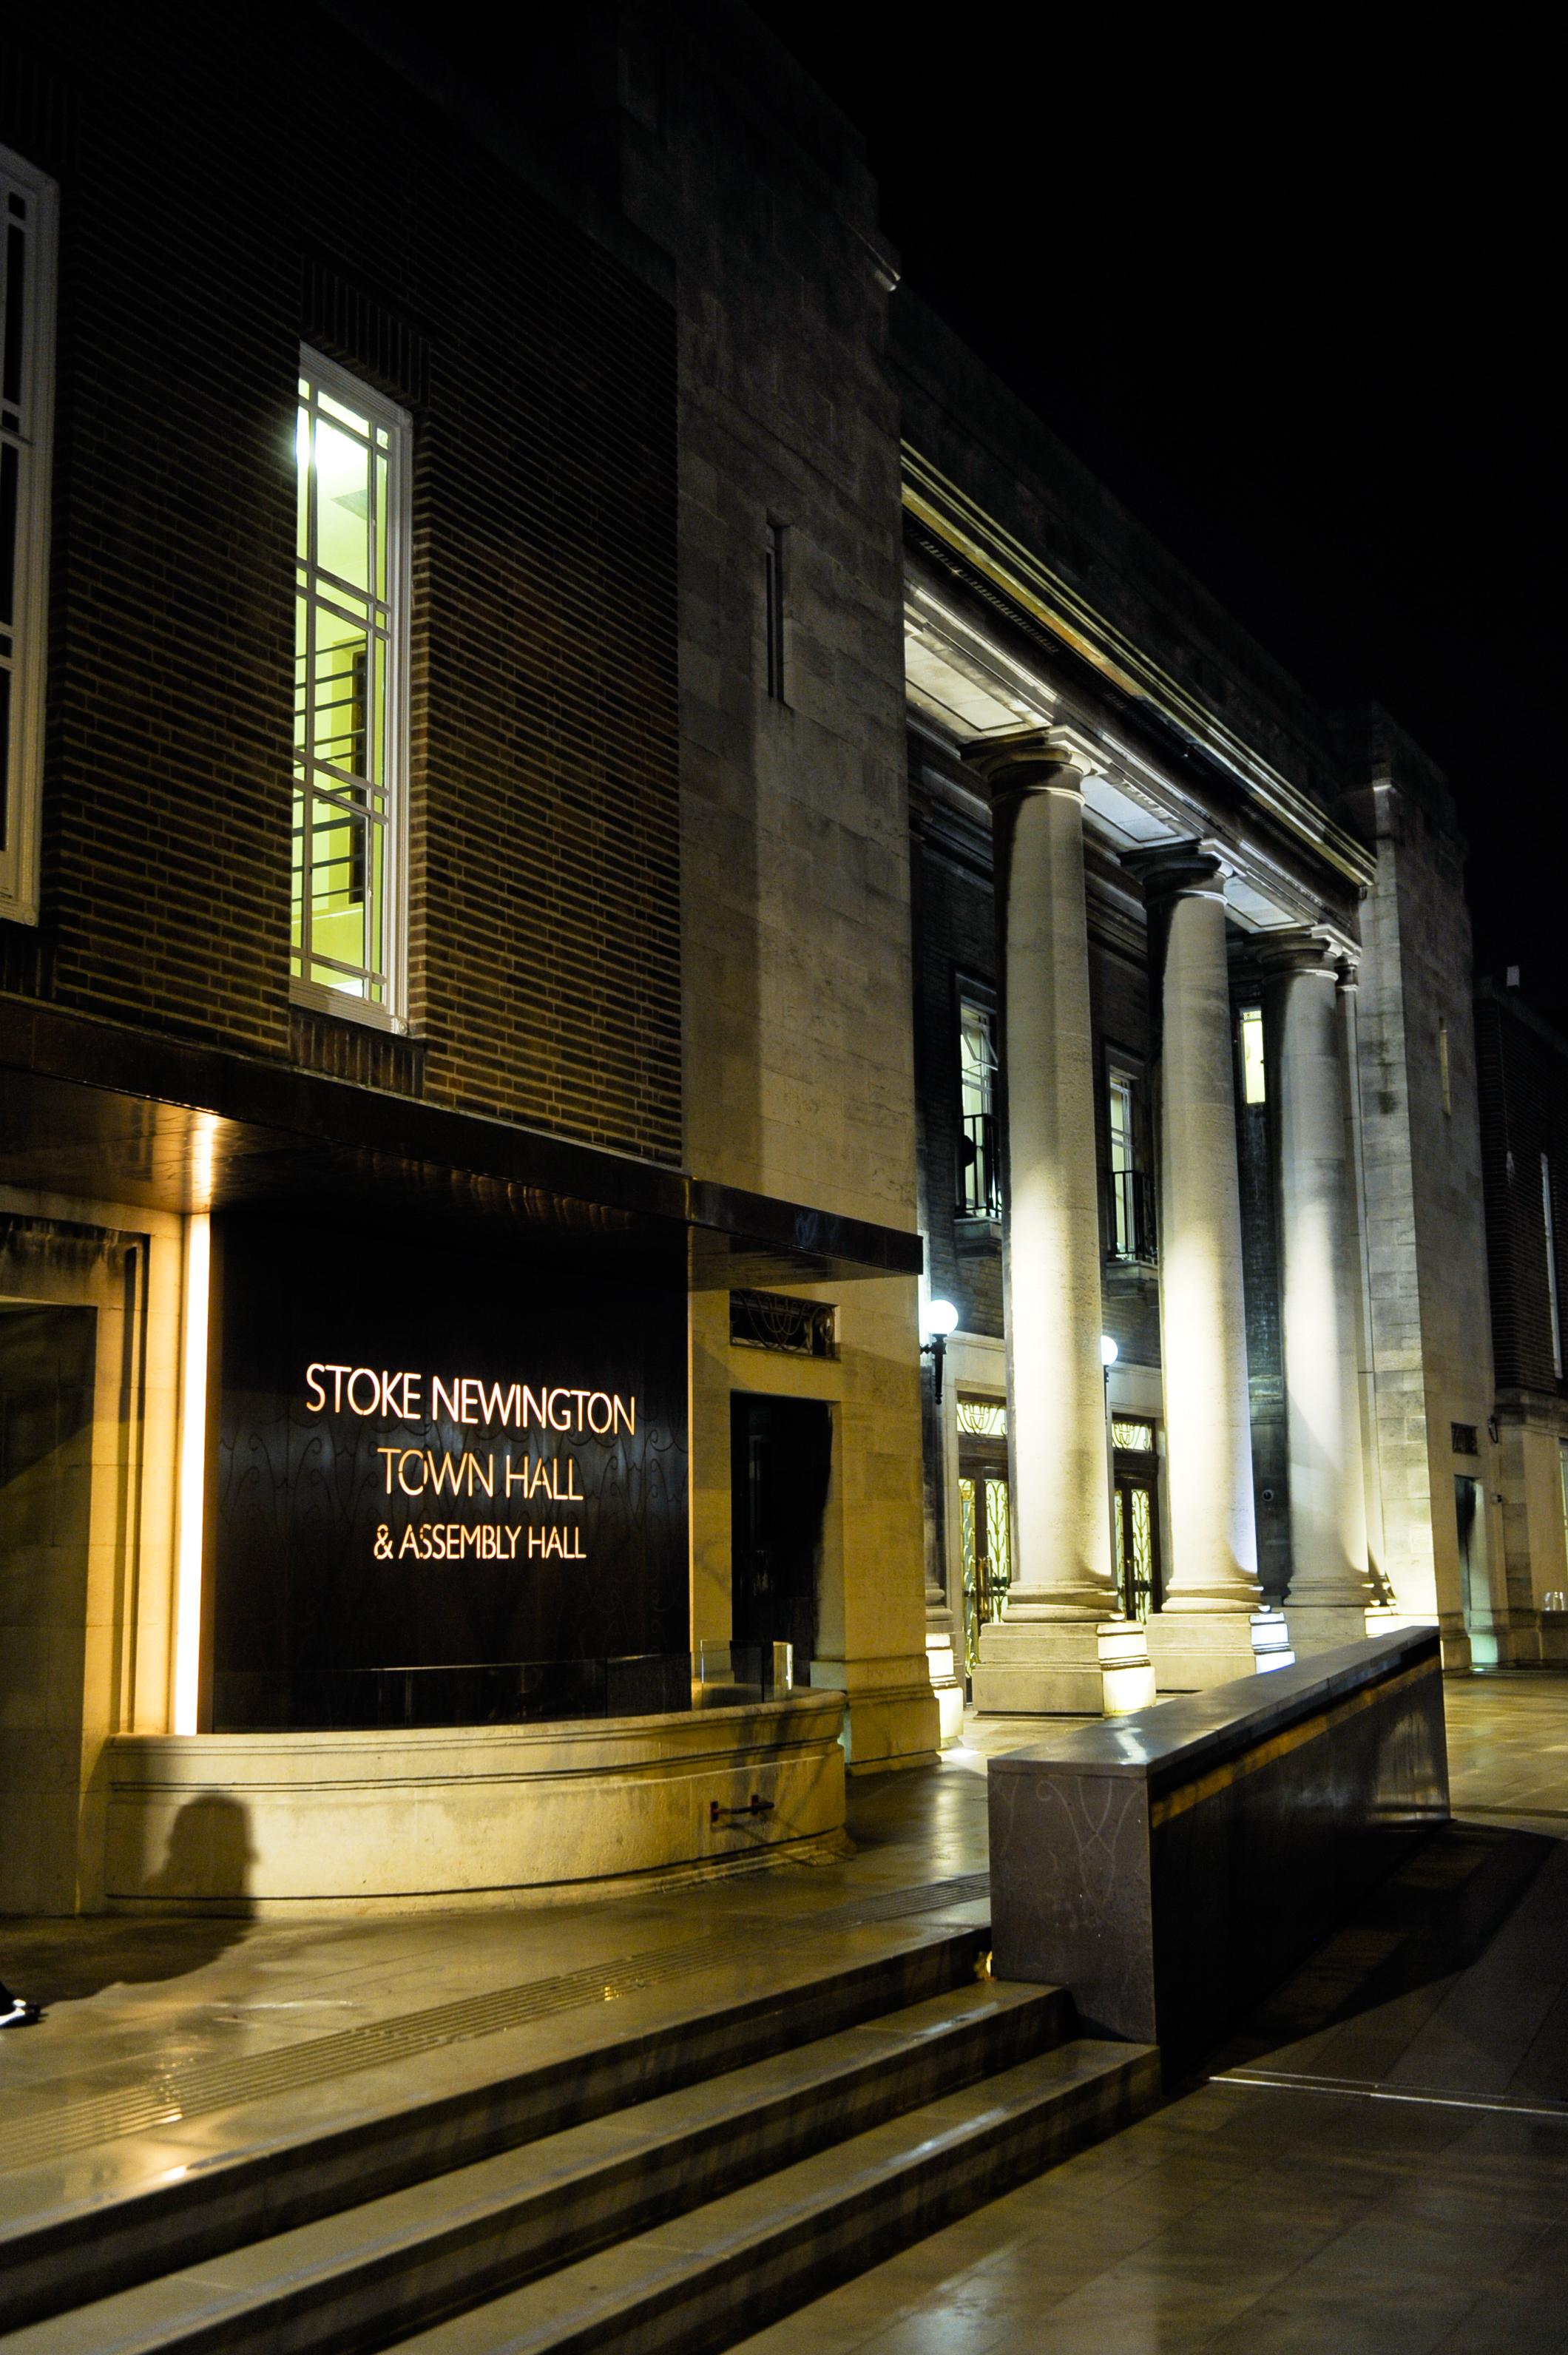 Entrance to Stoke Newington Town Hall